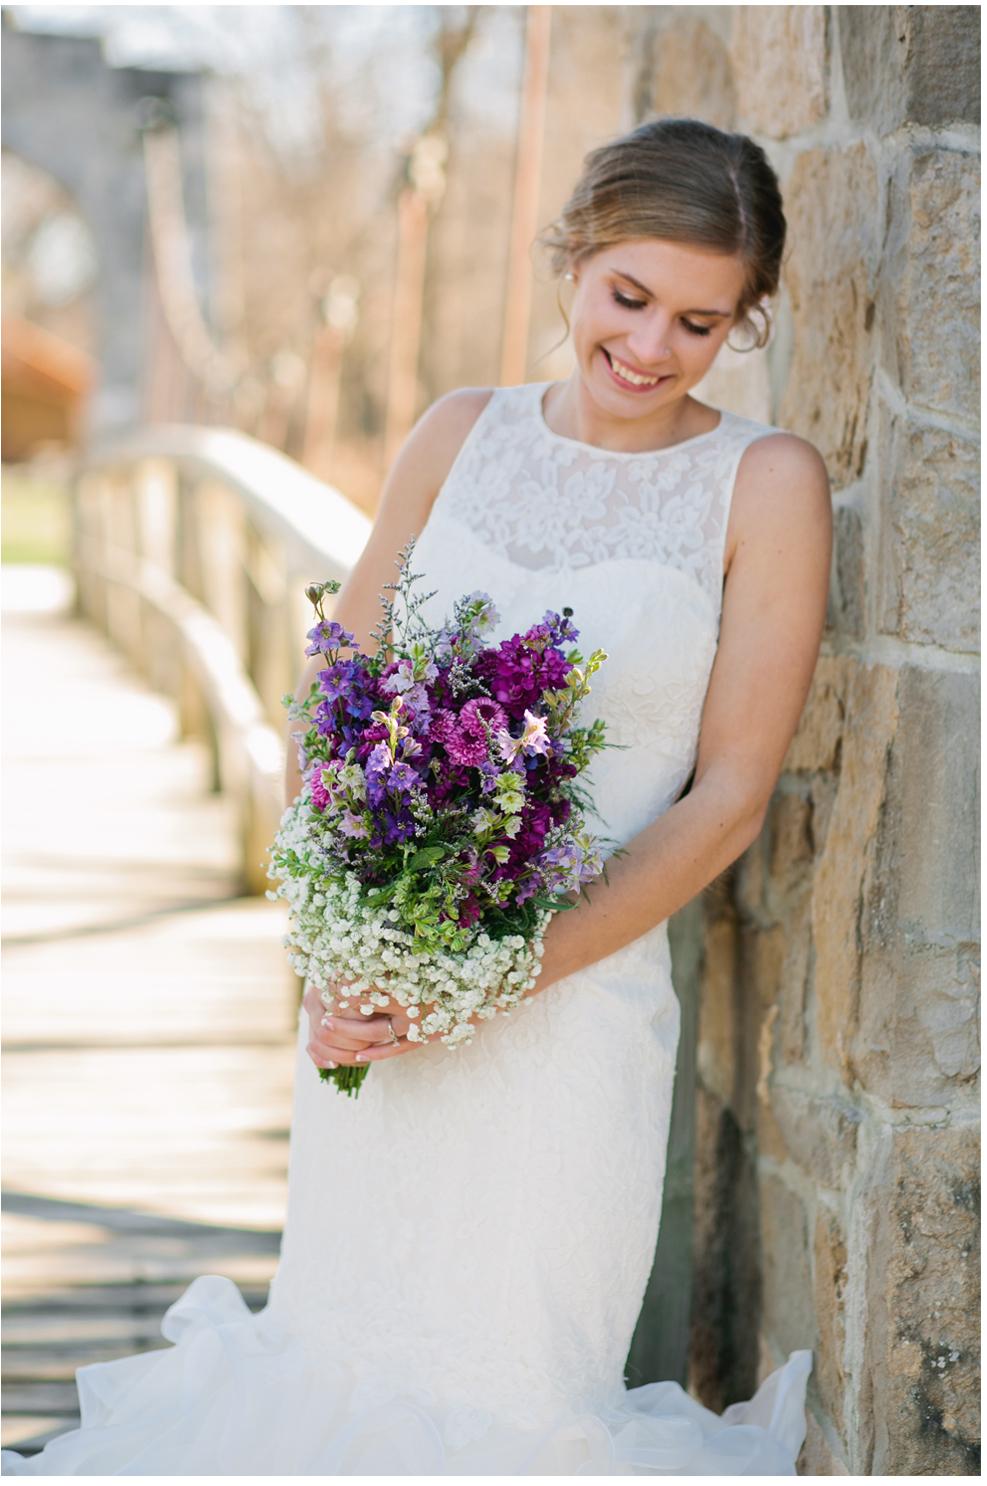 Ames wedding florists